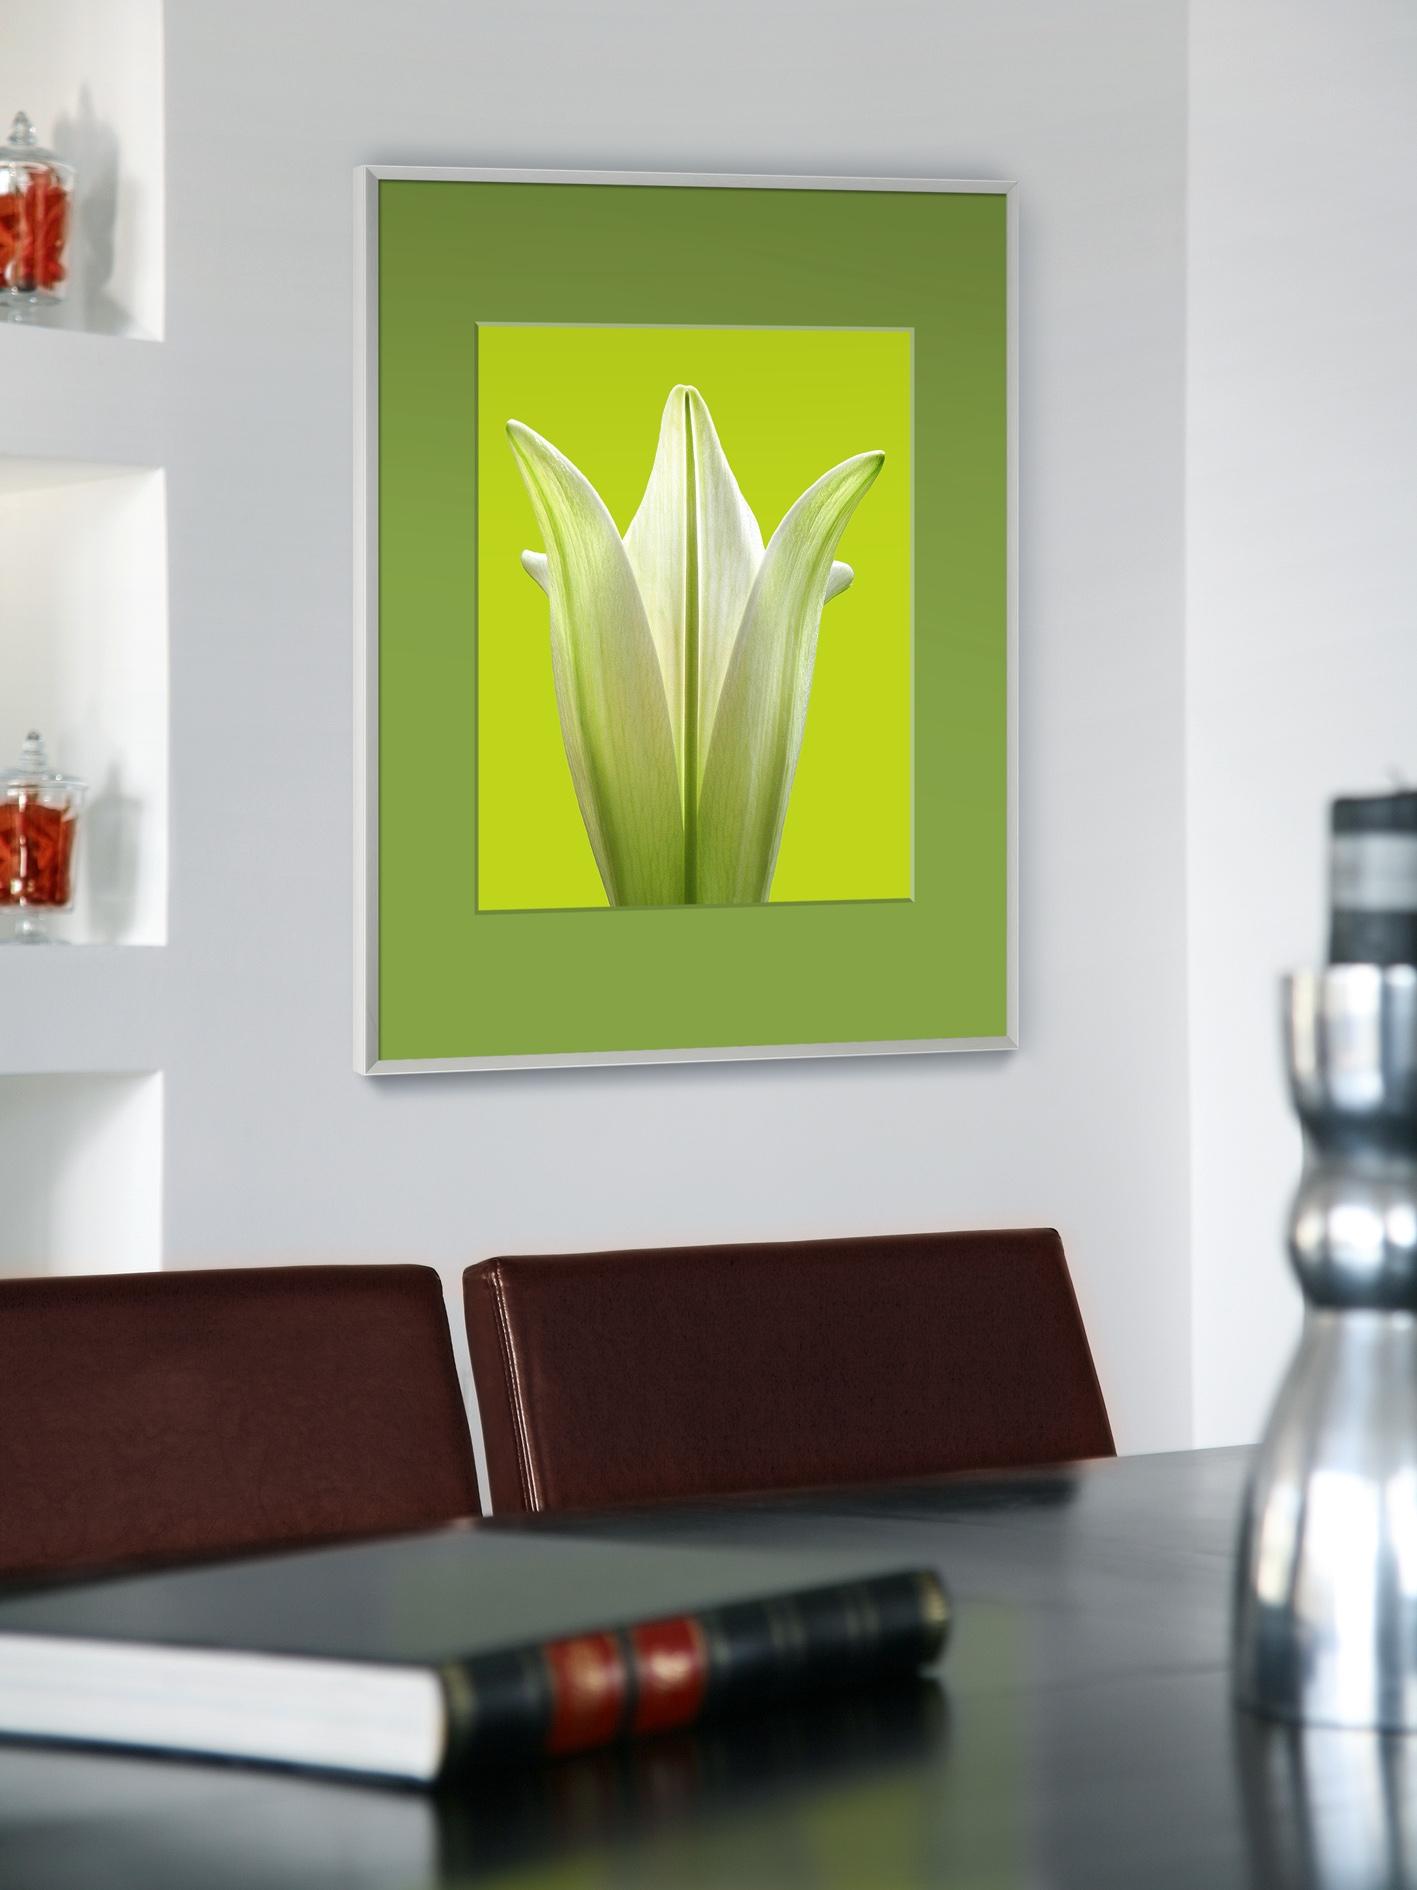 pixel aluminium bilderrahmen produkte nielsen. Black Bedroom Furniture Sets. Home Design Ideas